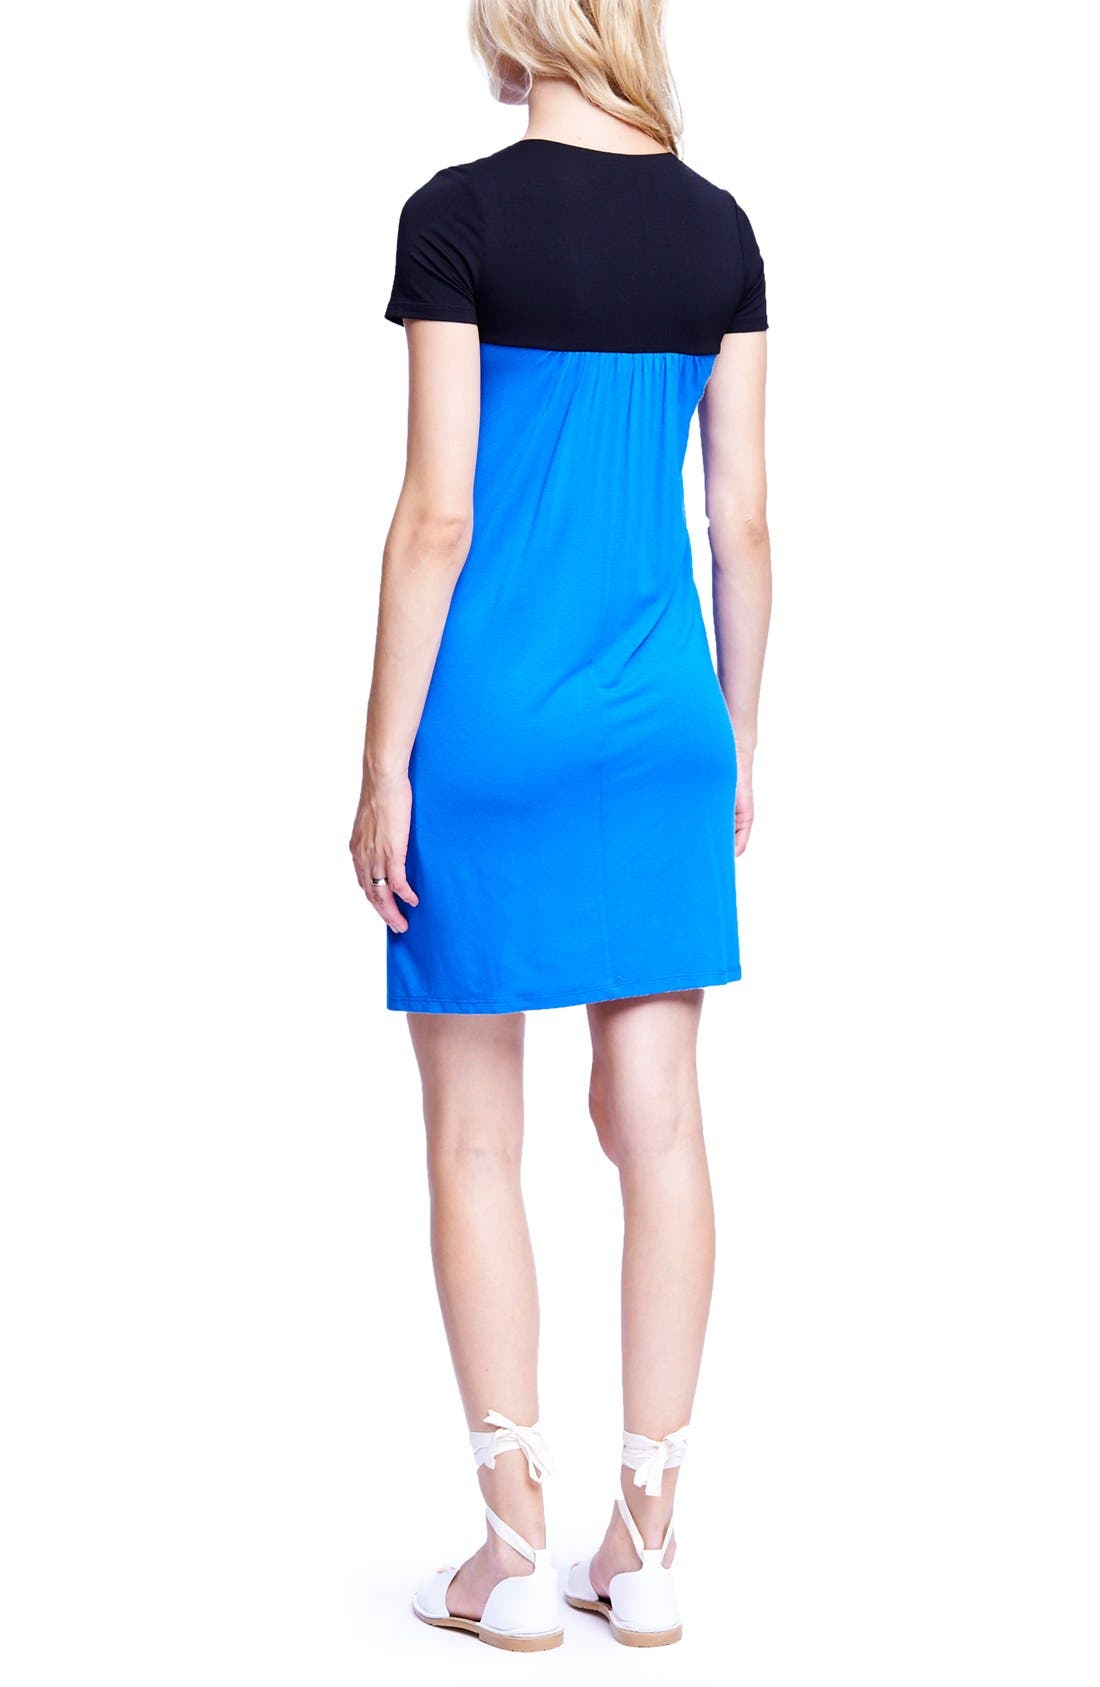 MATERNAL AMERICA,                             Babydoll Maternity/Nursing Dress,                             Alternate thumbnail 2, color,                             BLACK/ ROYAL BLUE